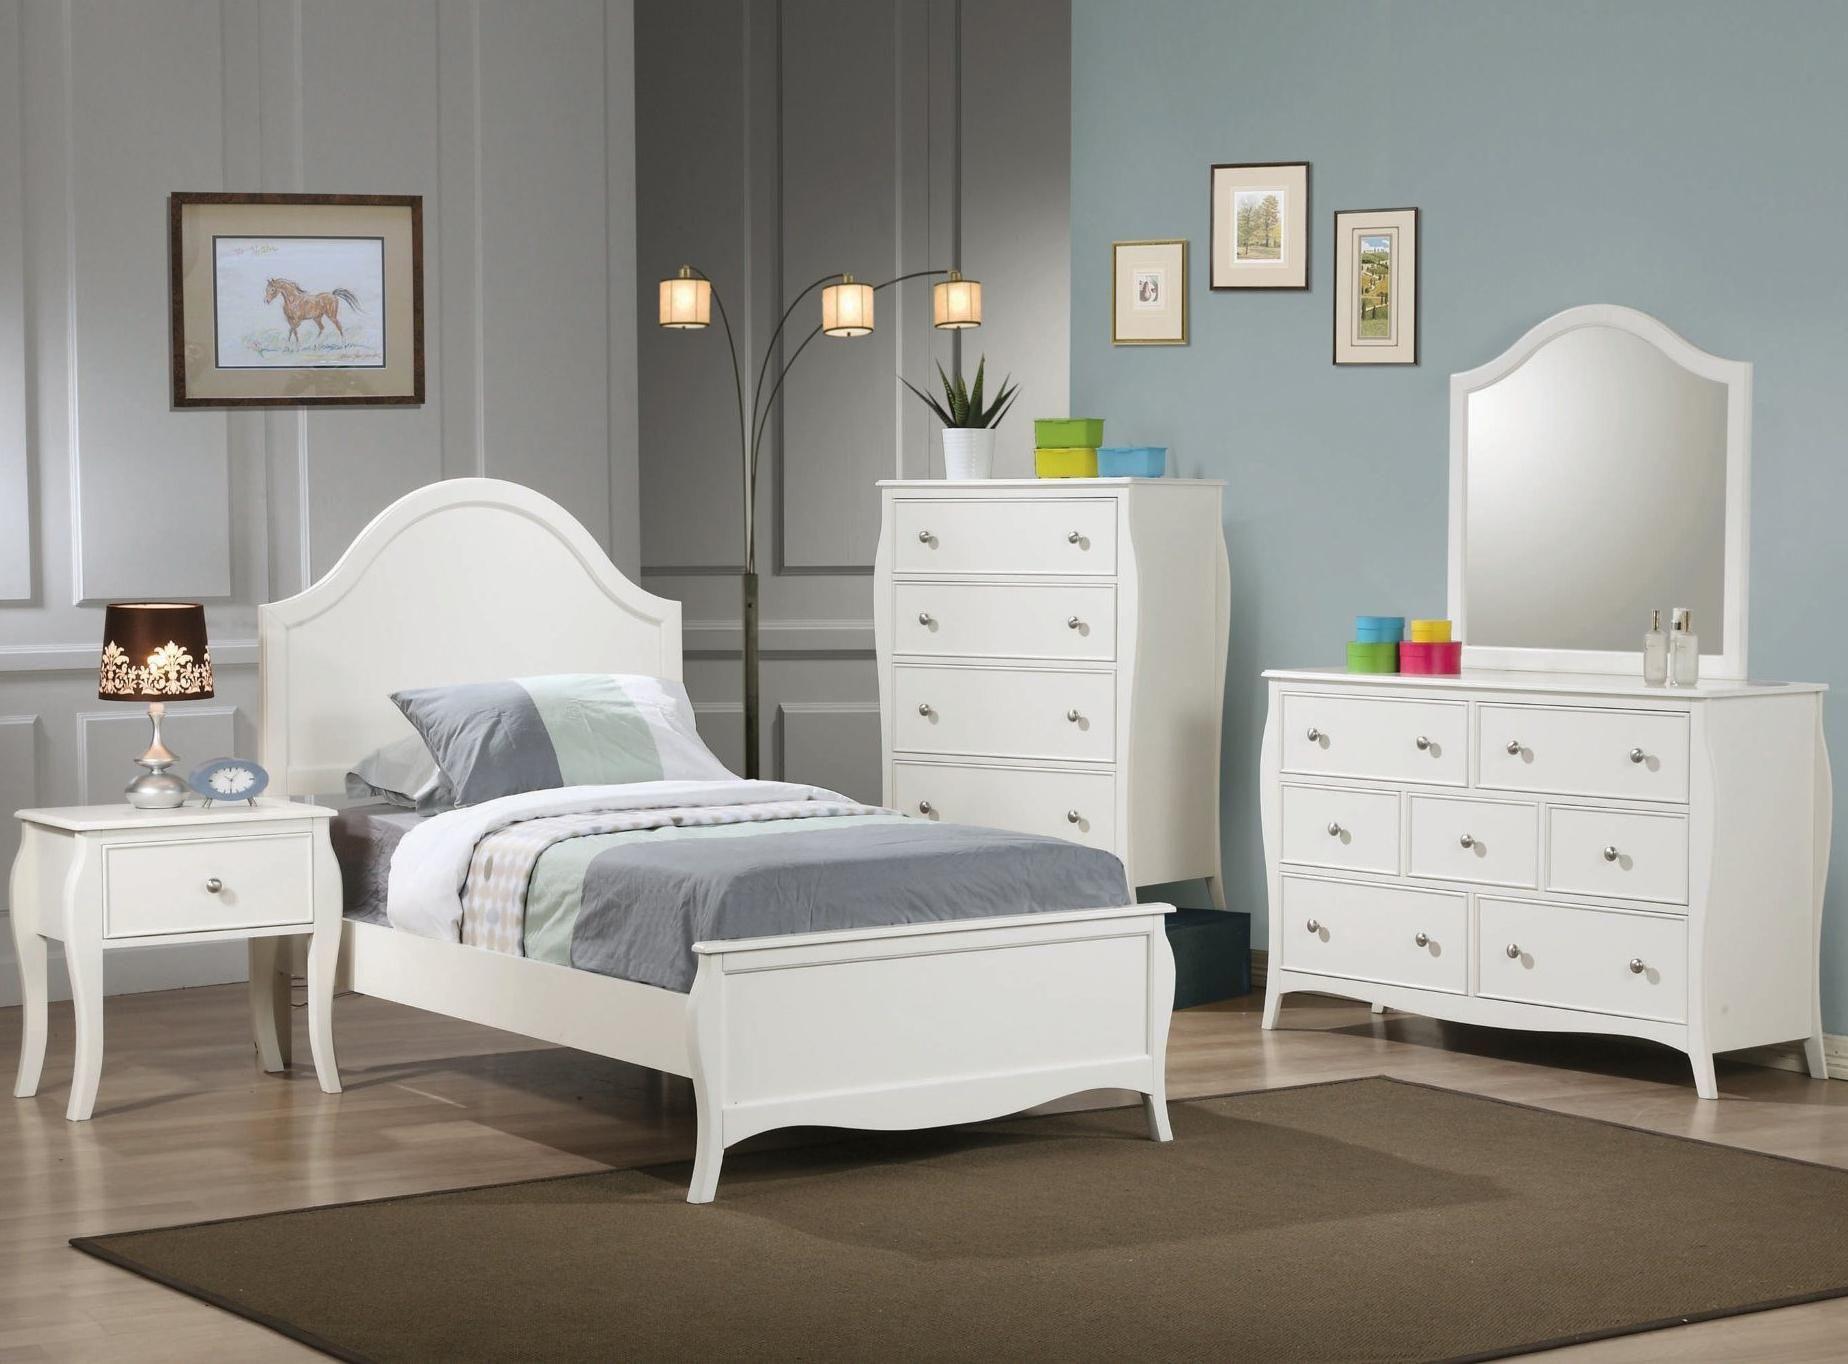 Kid Bedroom Sets Endearing Dominique 400560Coaster  Coaster Fine Furniture  Coaster Inspiration Design